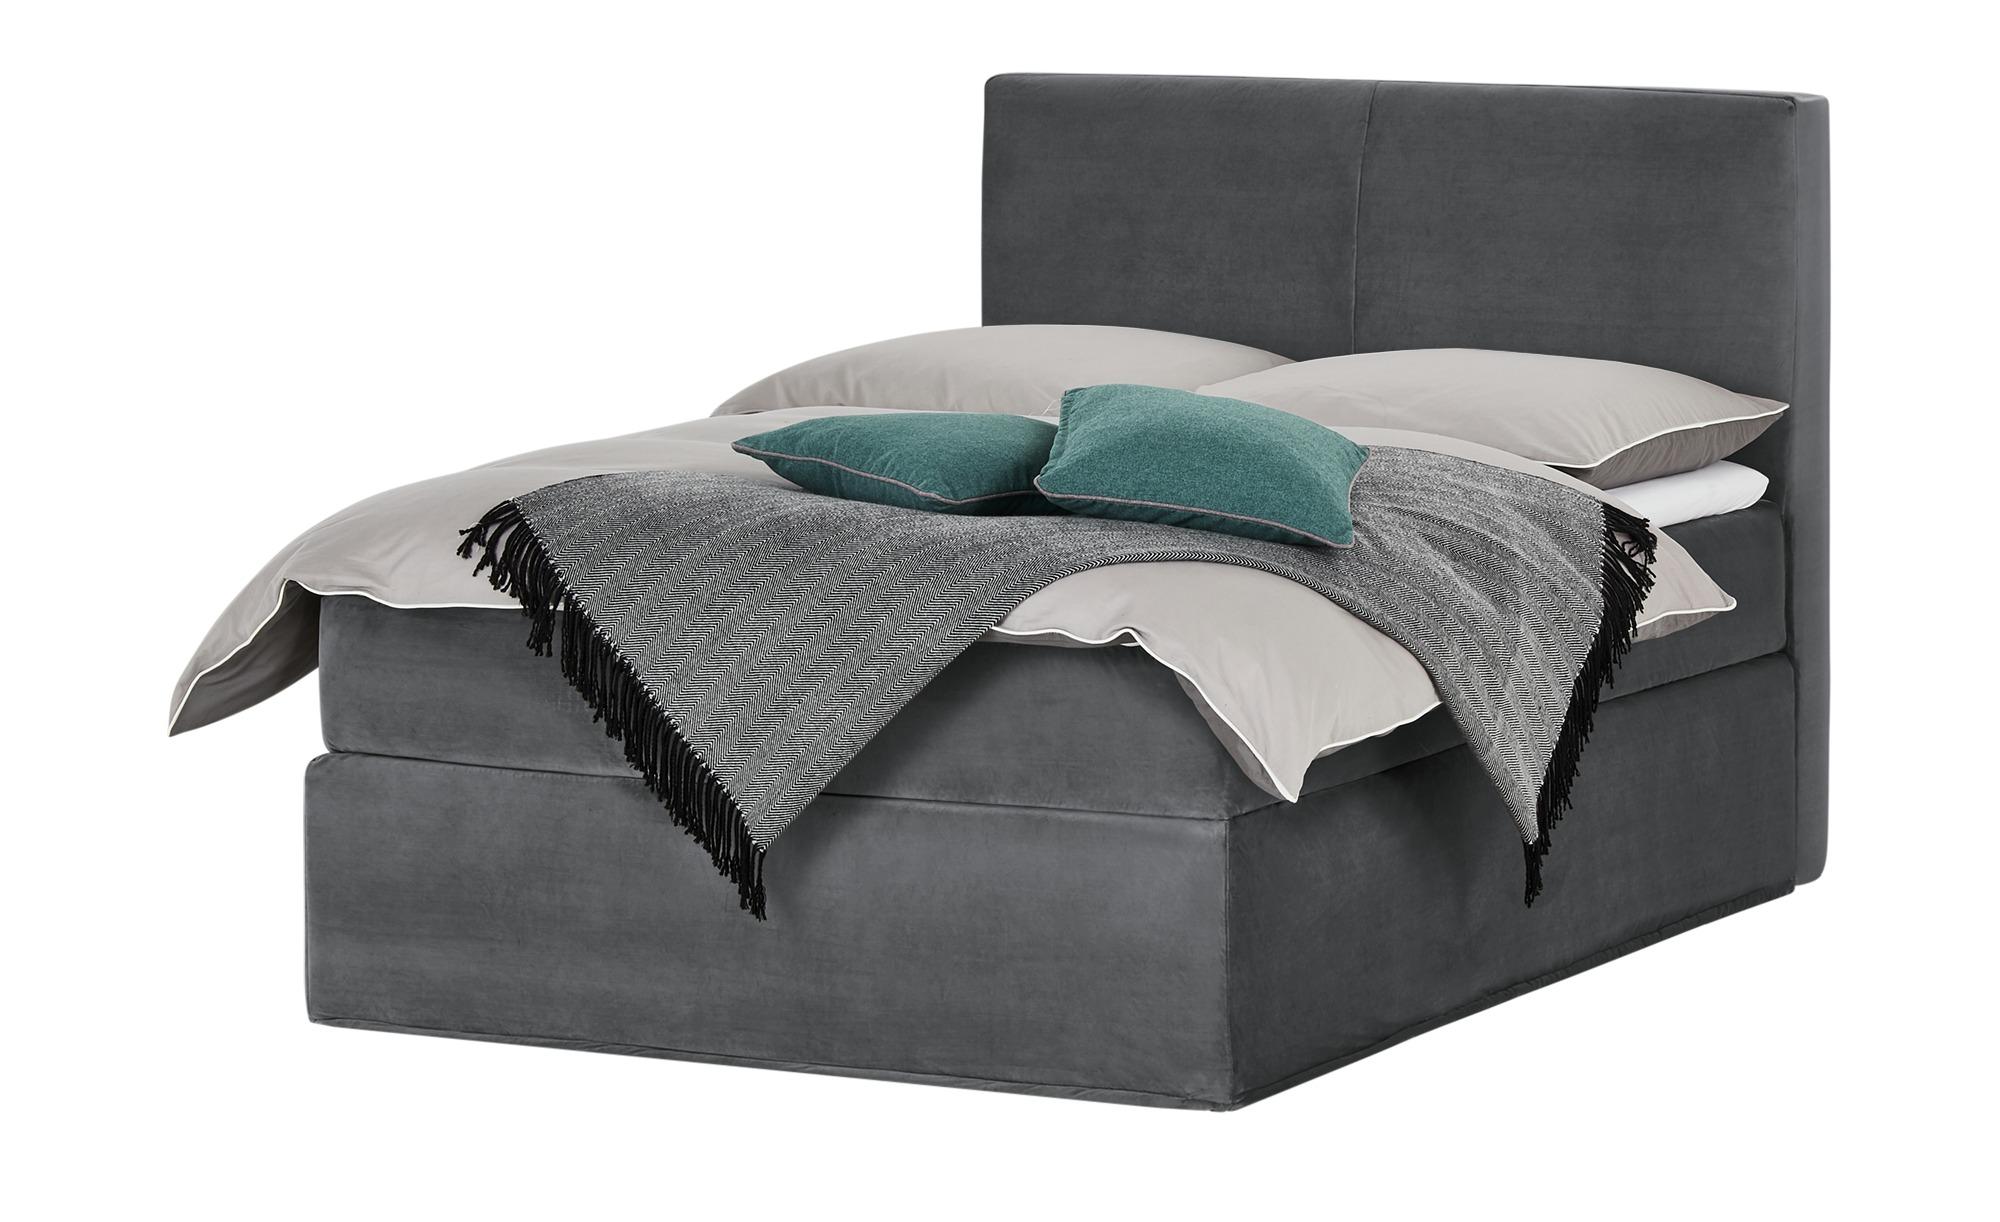 Boxspringbett 140 x 200 cm - grau - Betten > Boxspringbetten > Boxspringbet günstig online kaufen